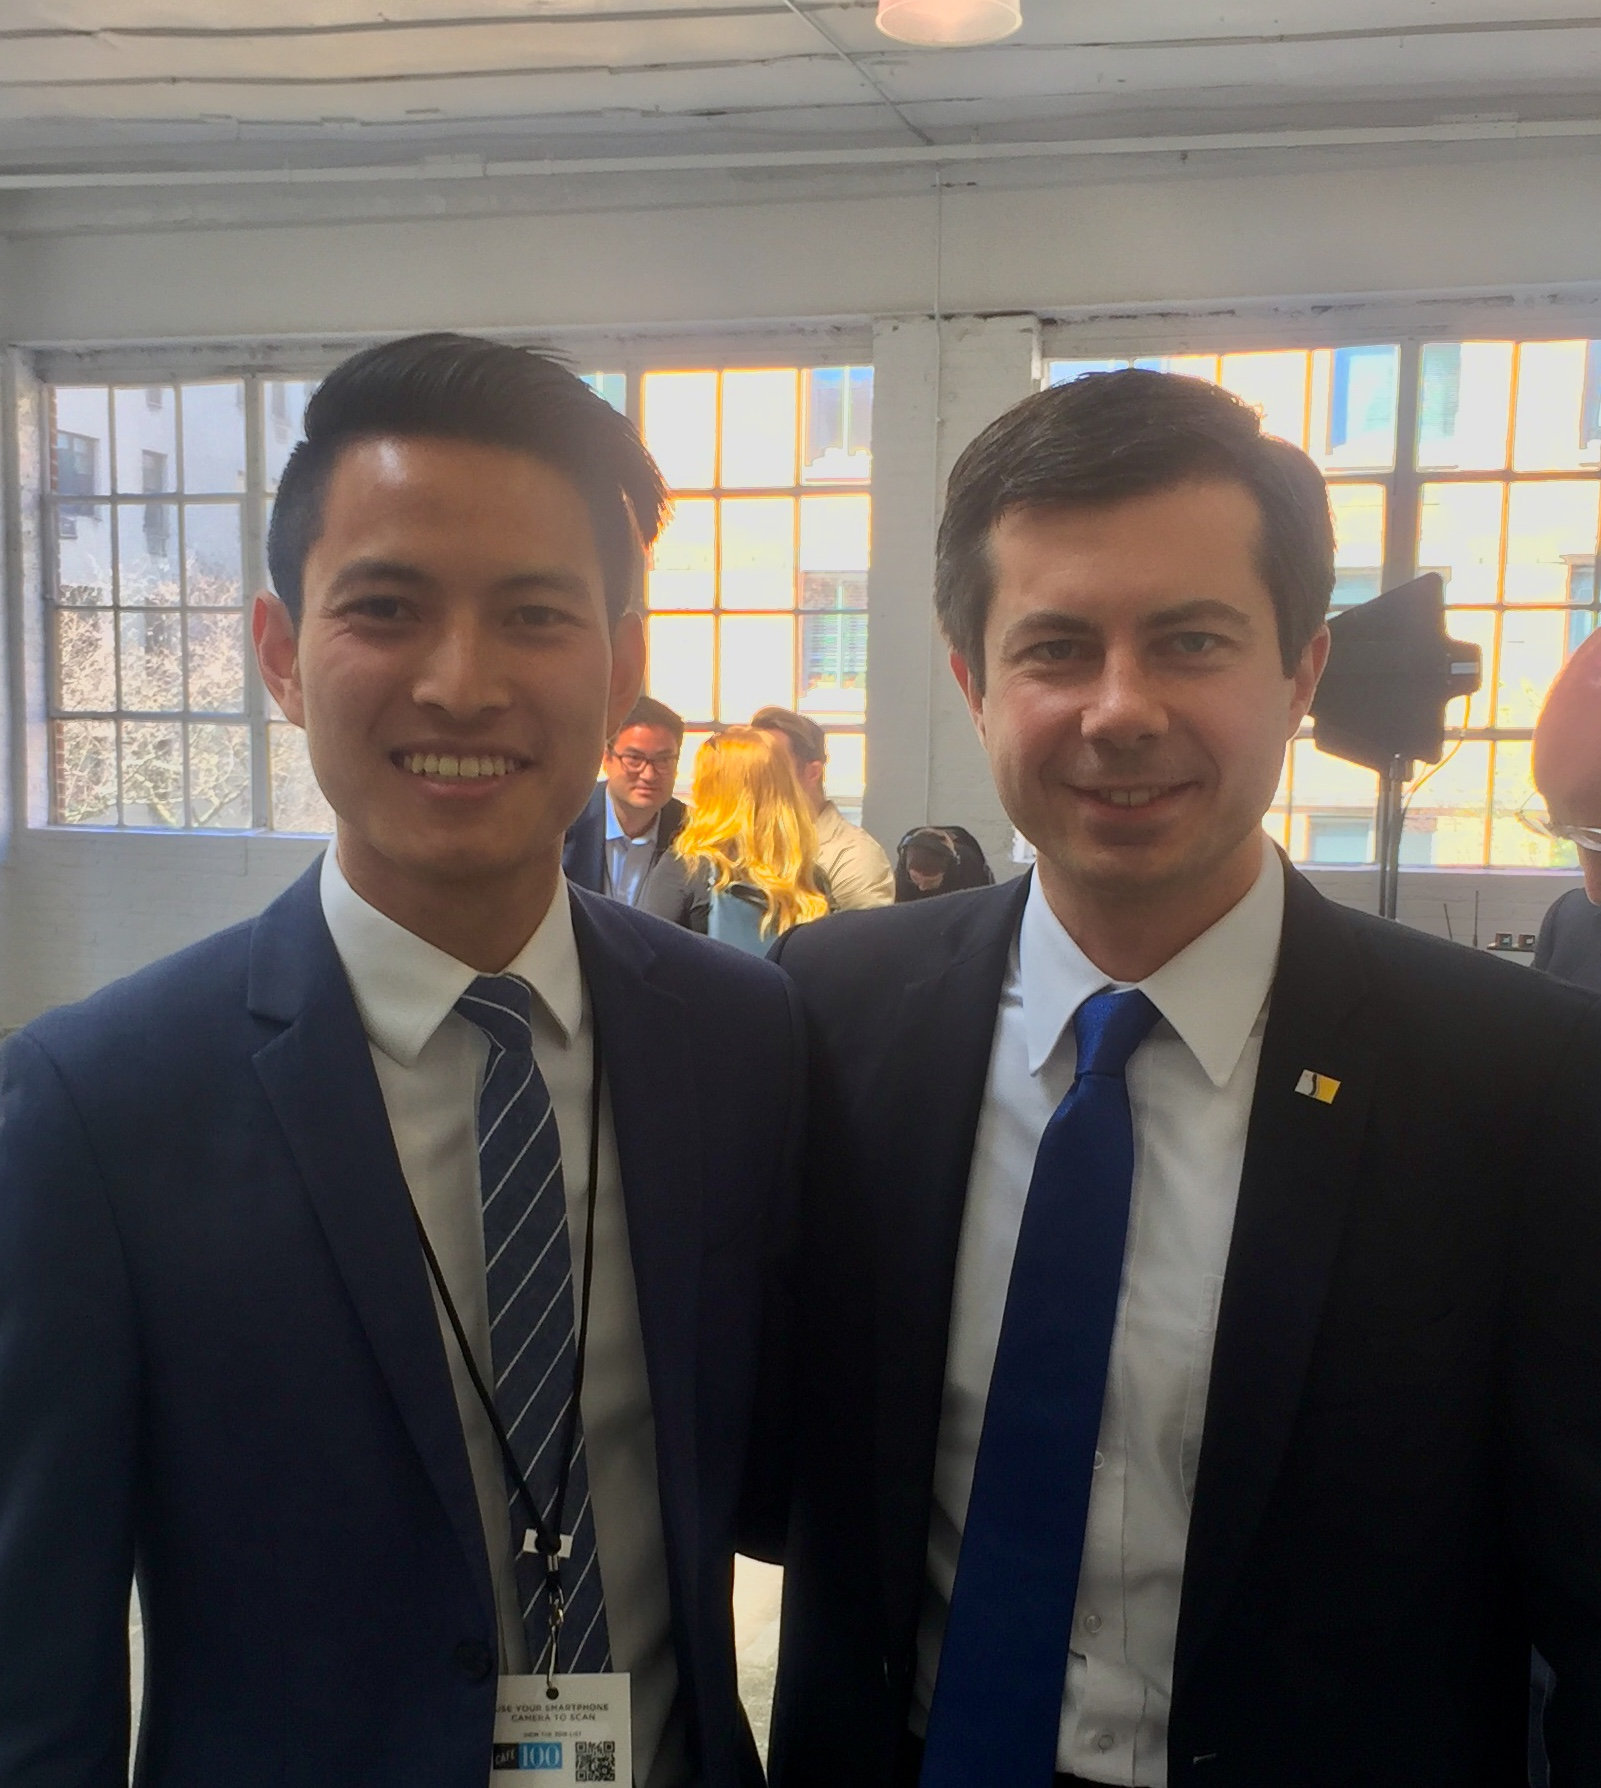 Matt Nguyen with South Bend Mayor and U.S. presidential candidate, Pete Buttigieg.